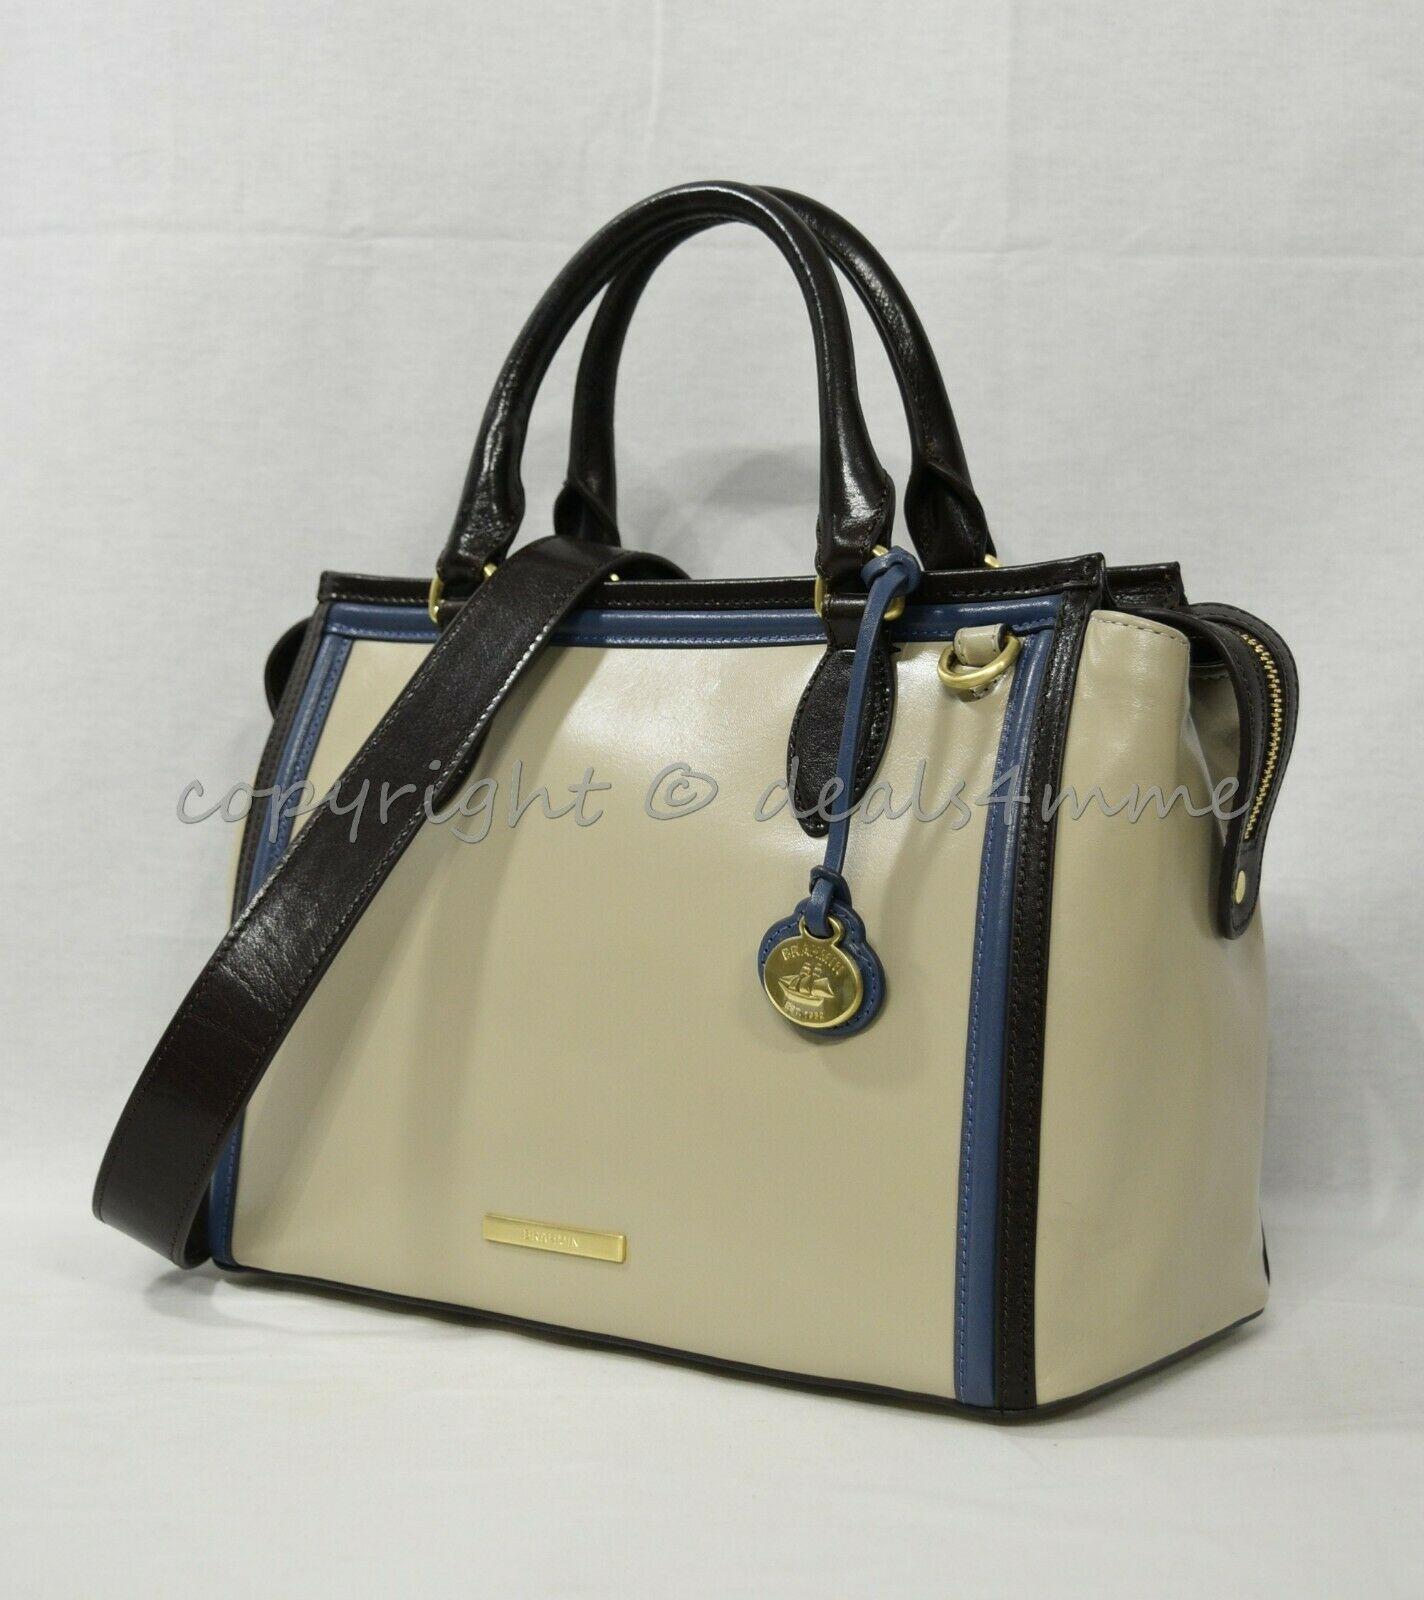 NWT Brahmin Schooner Smooth Leather Satchel/Shoulder Bag in Sand Westport